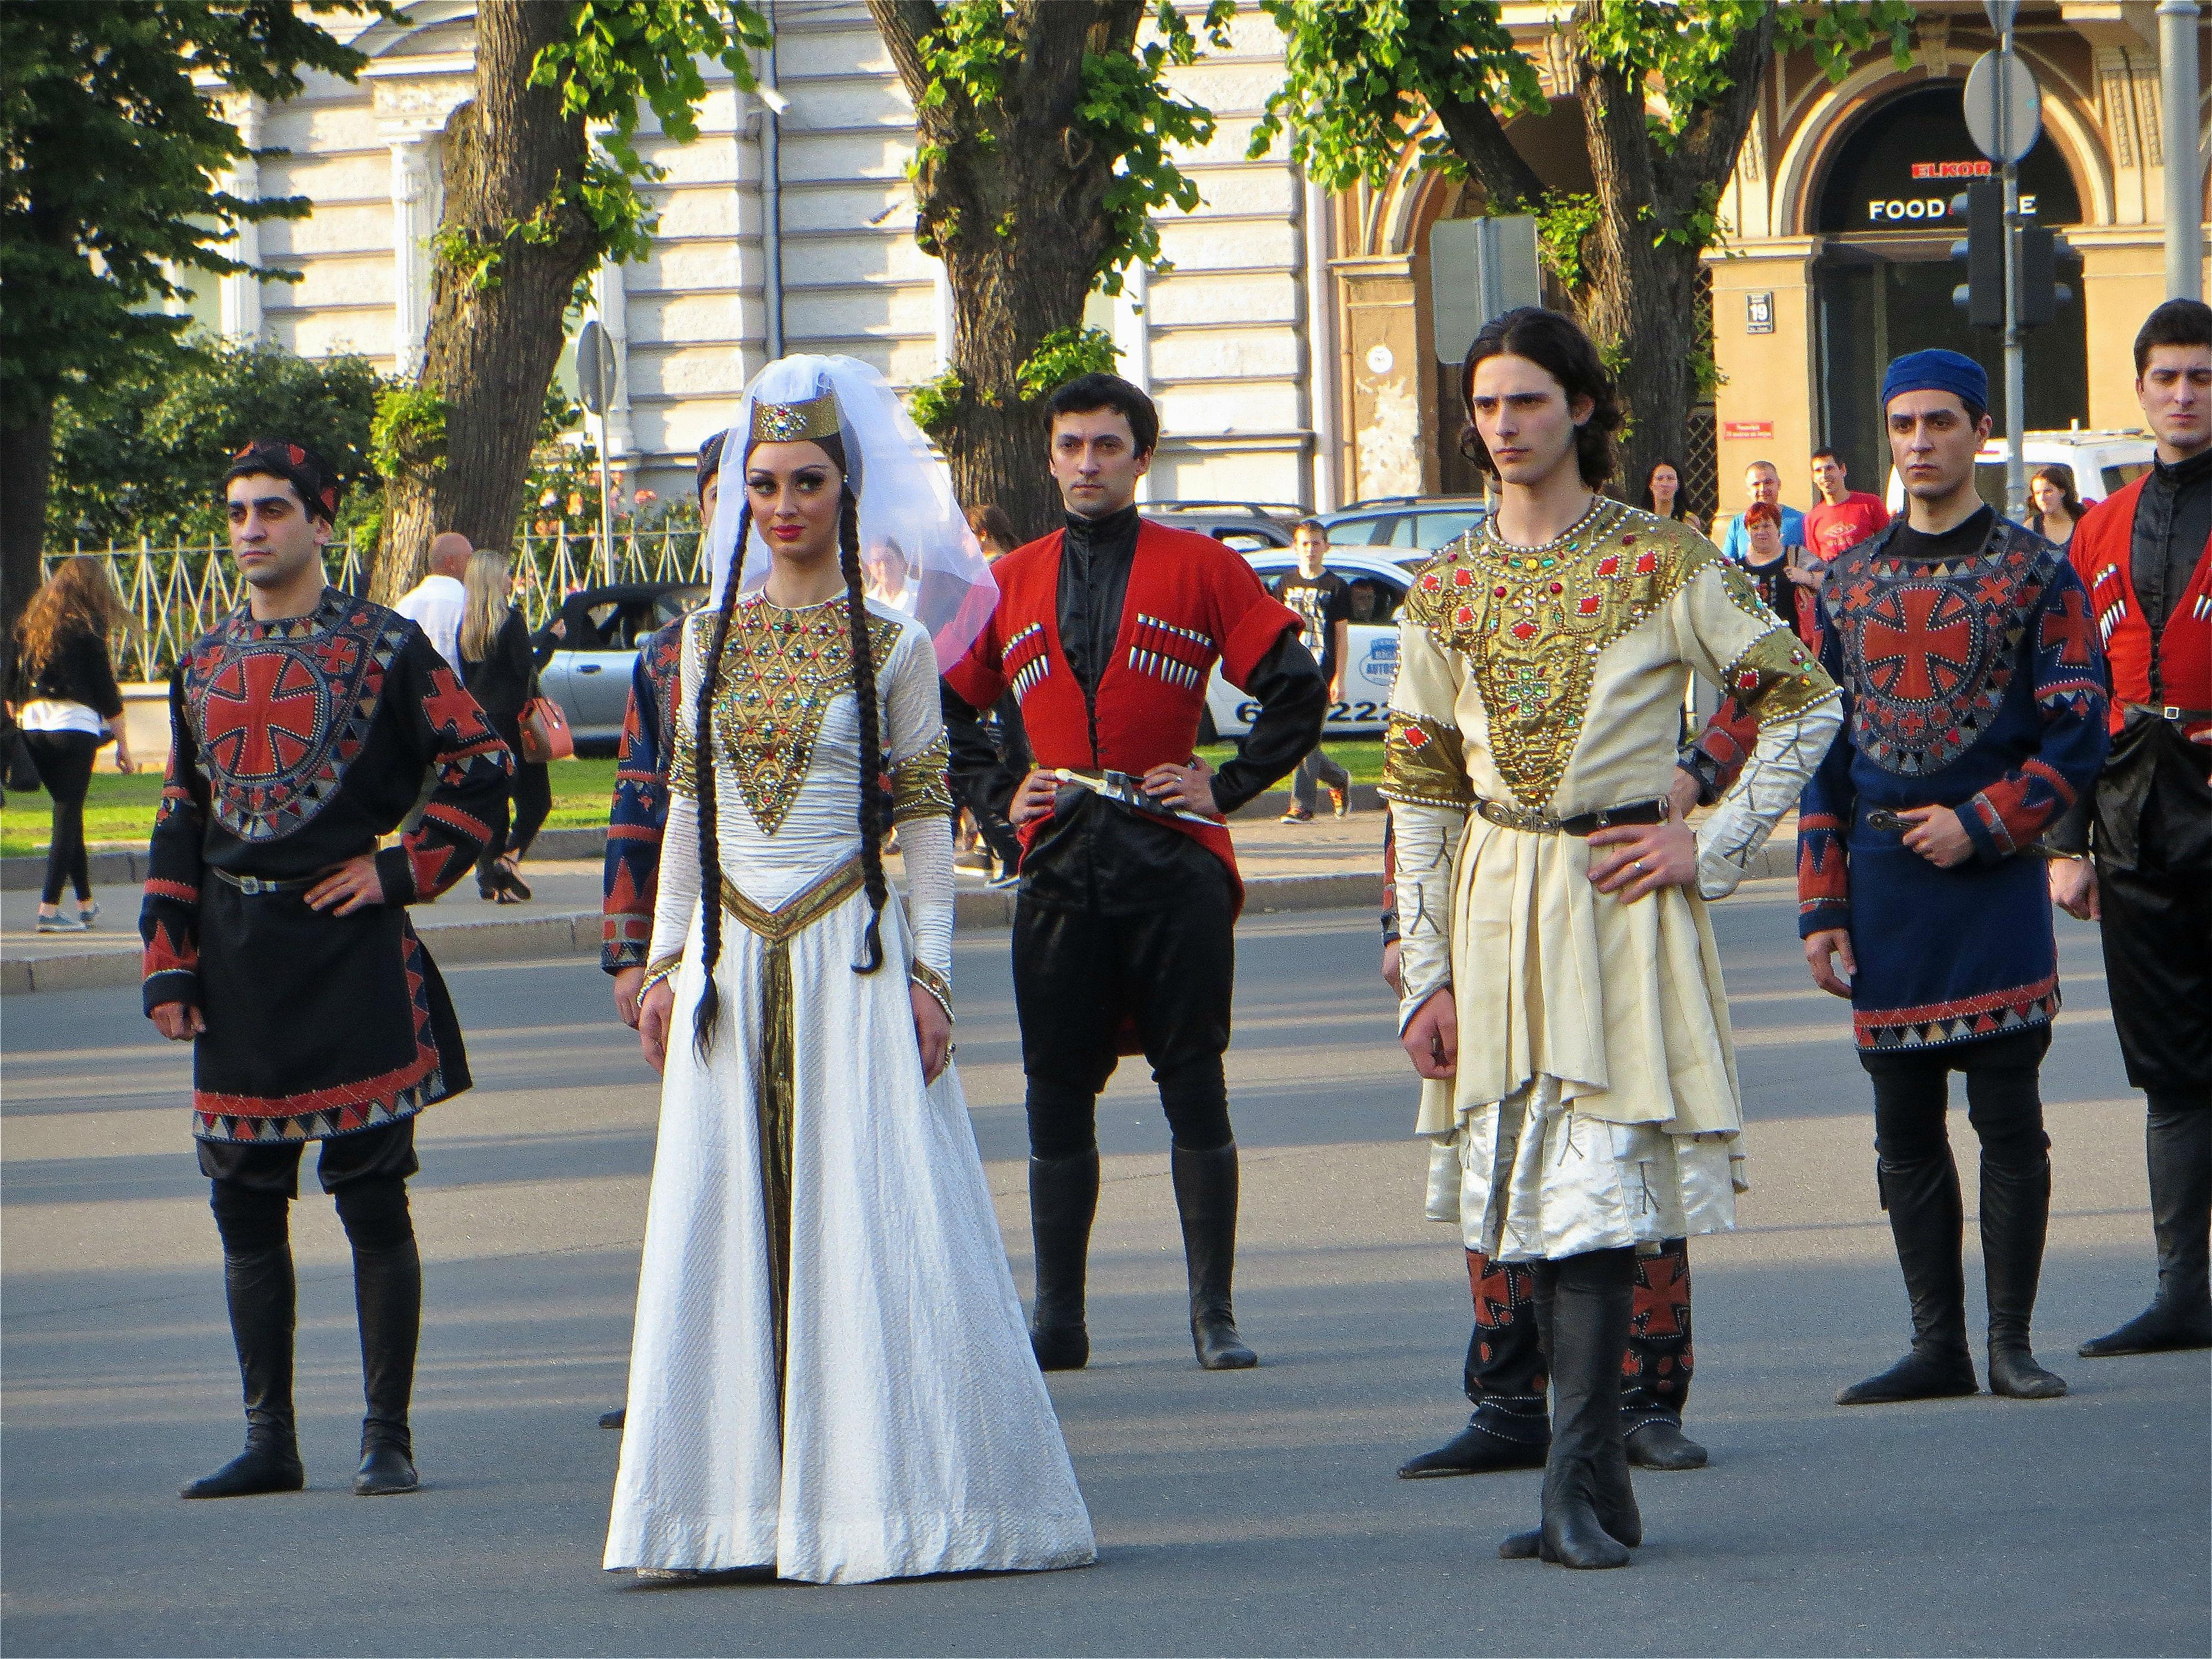 Country Girl Wallpaper File Georgians In National Costumes 2014 Jpg Wikimedia